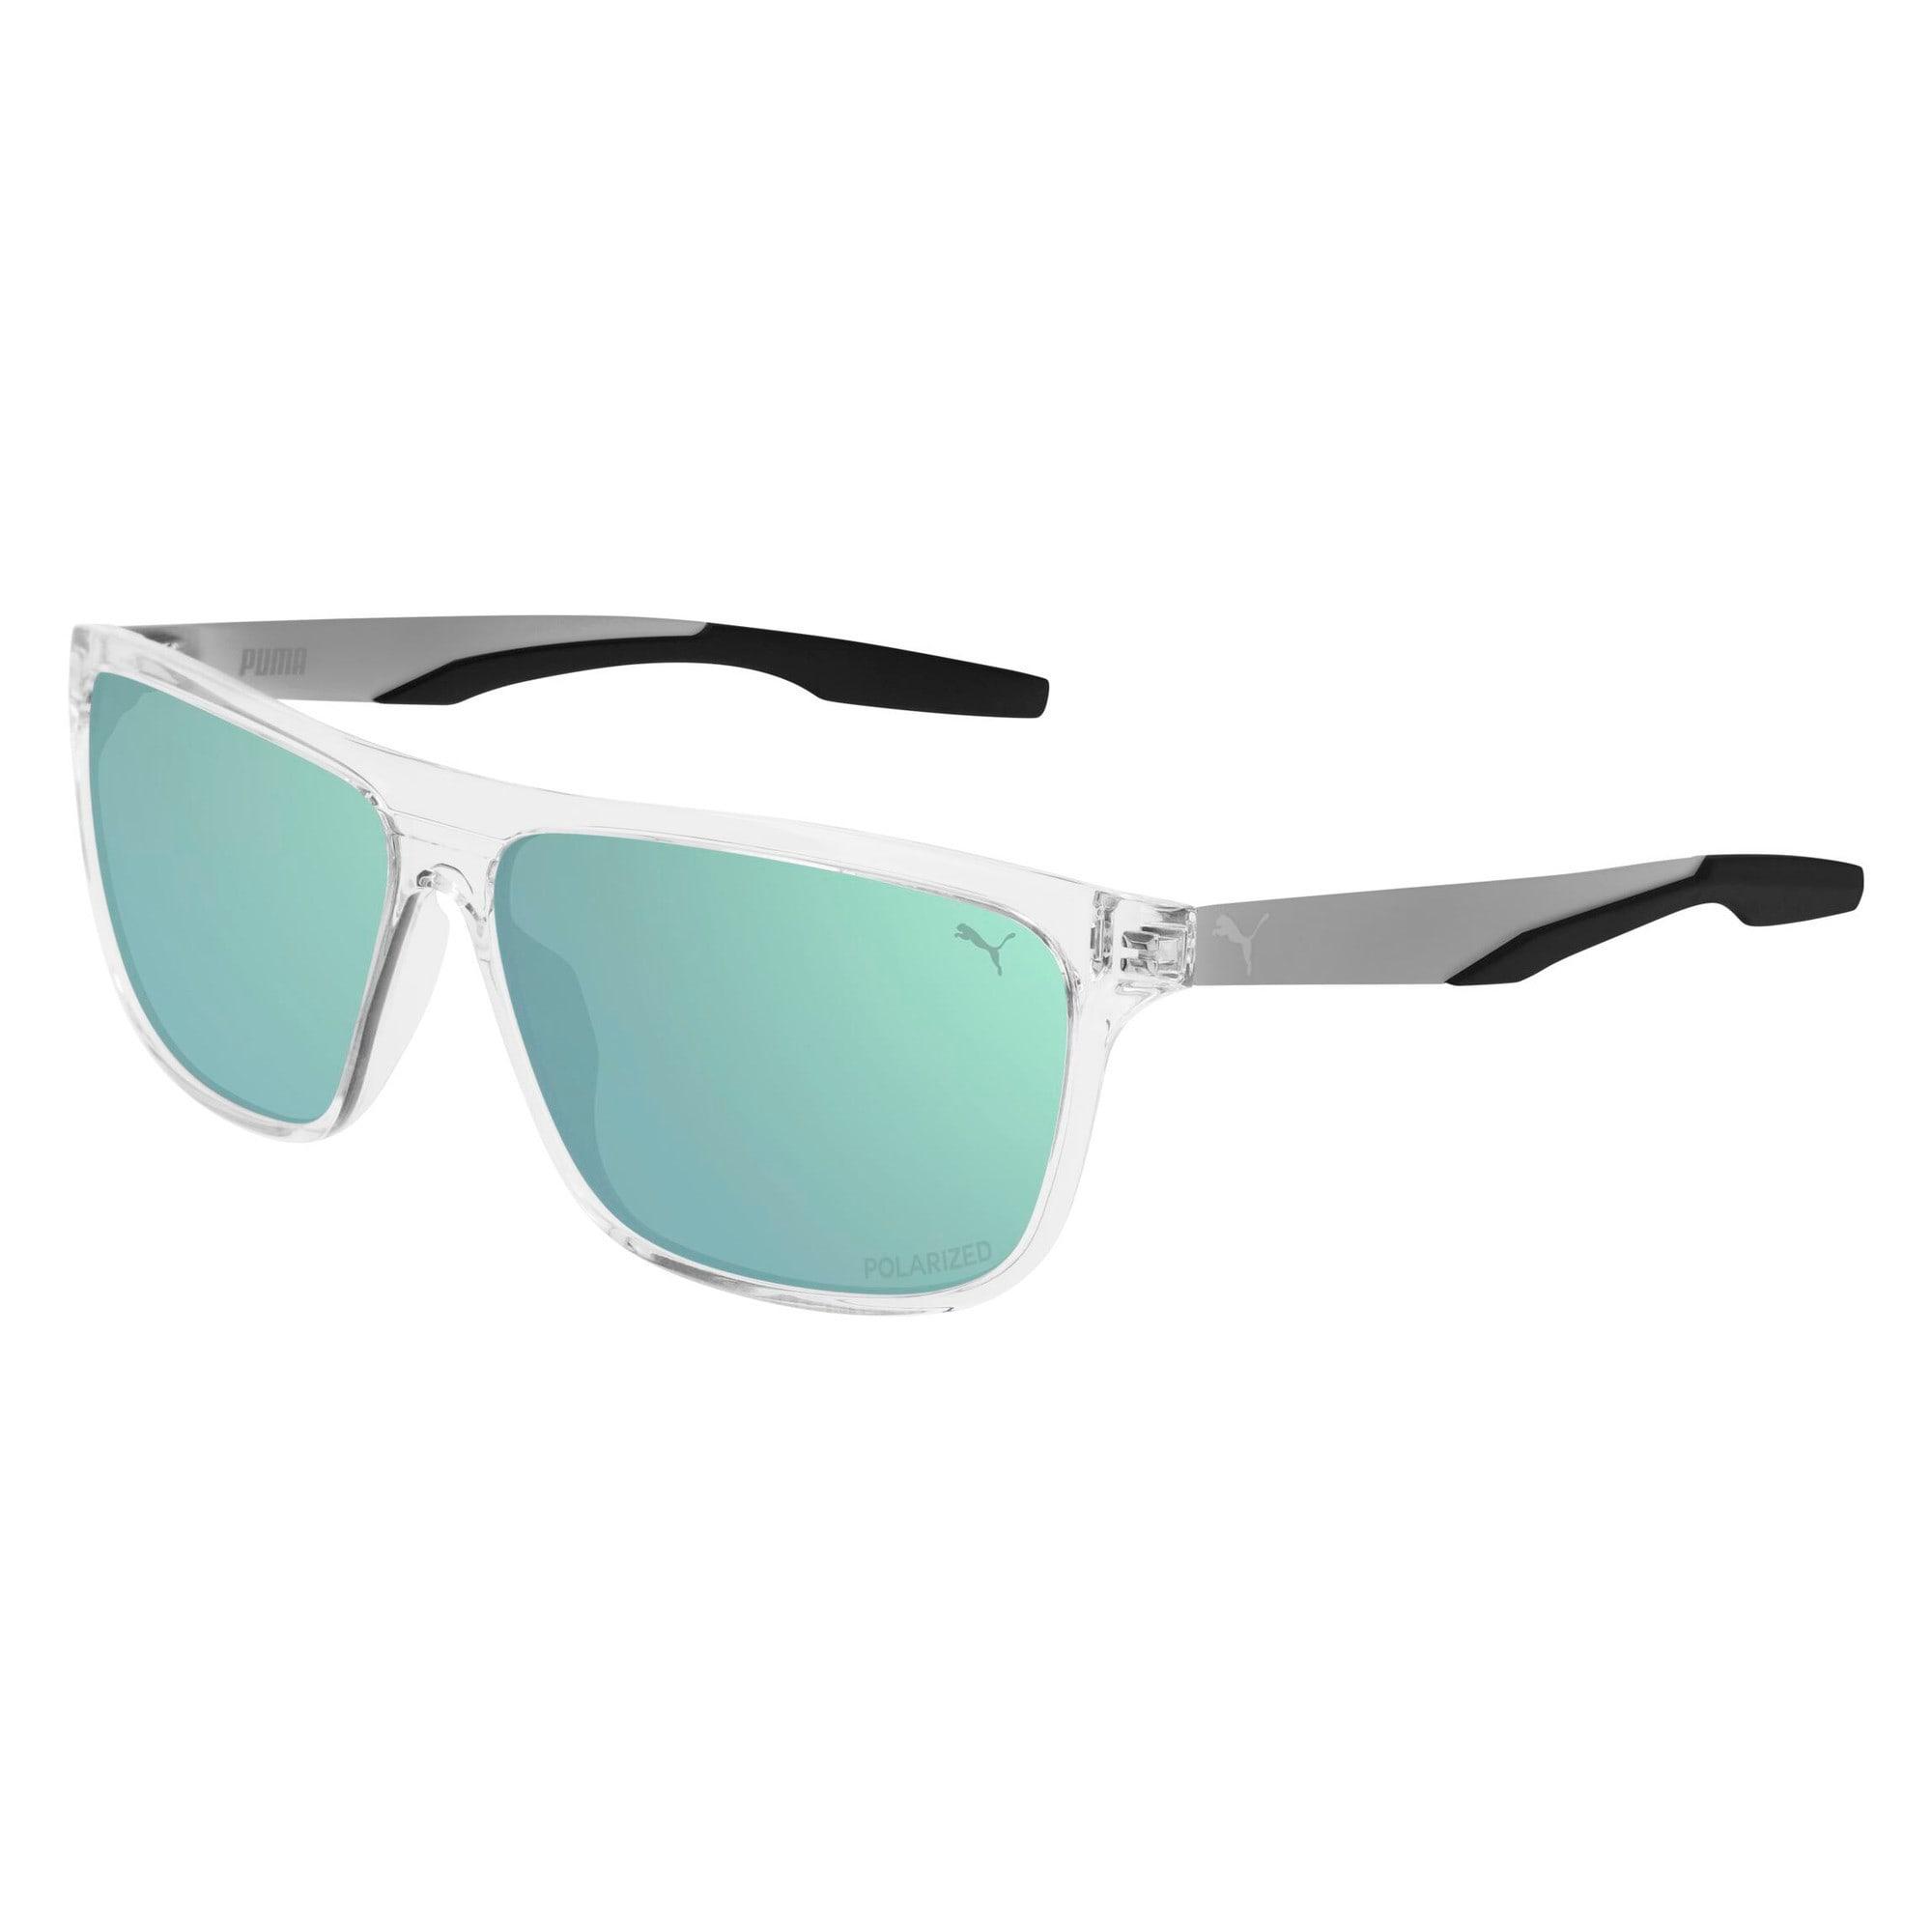 Thumbnail 1 of Laguna Sunglasses, CRYSTAL, medium